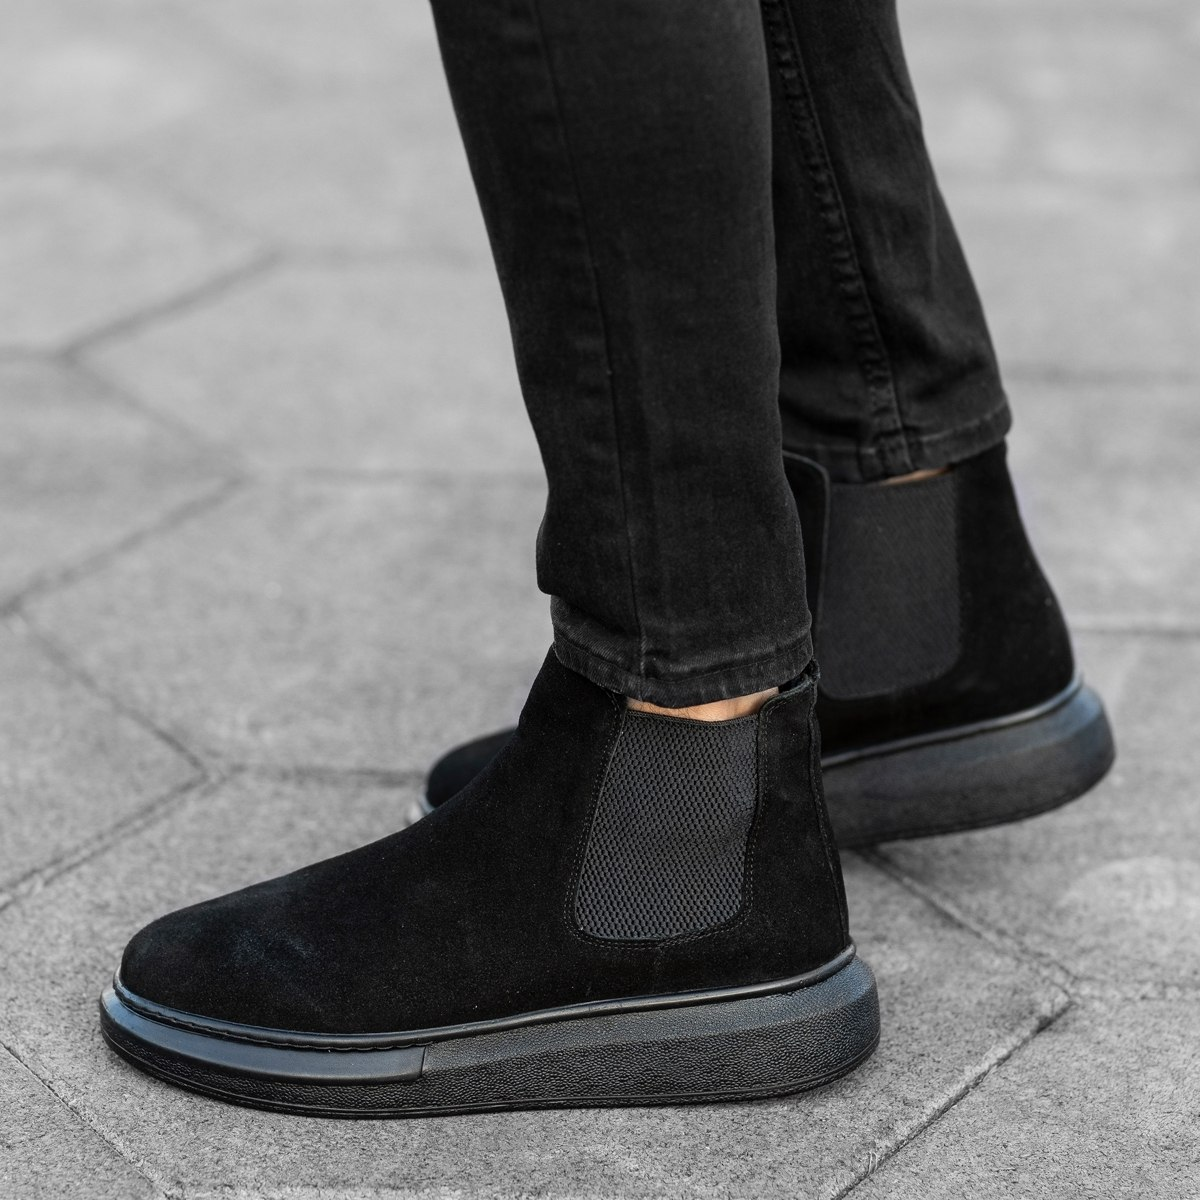 Genuine-Suede Hype Sole Chelsea Boots In Black Mv Premium Brand - 2